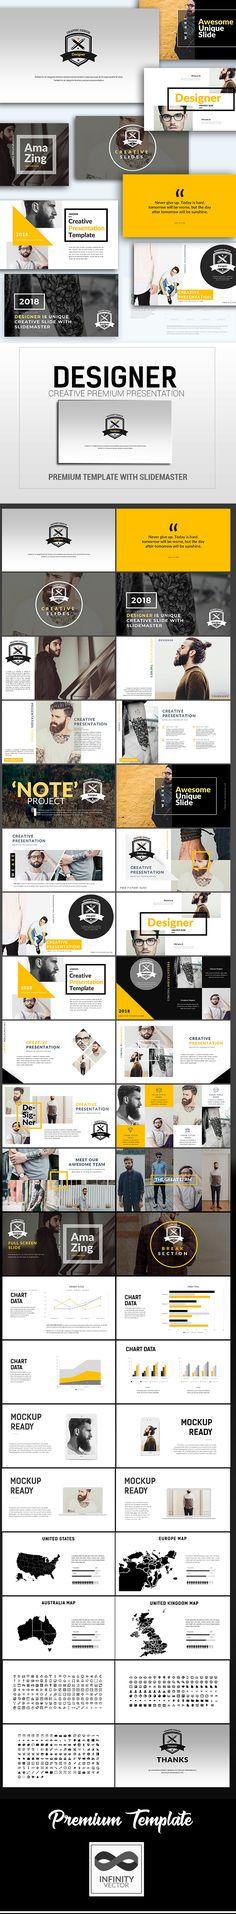 Designer Creative Presentation #powerpoint #template